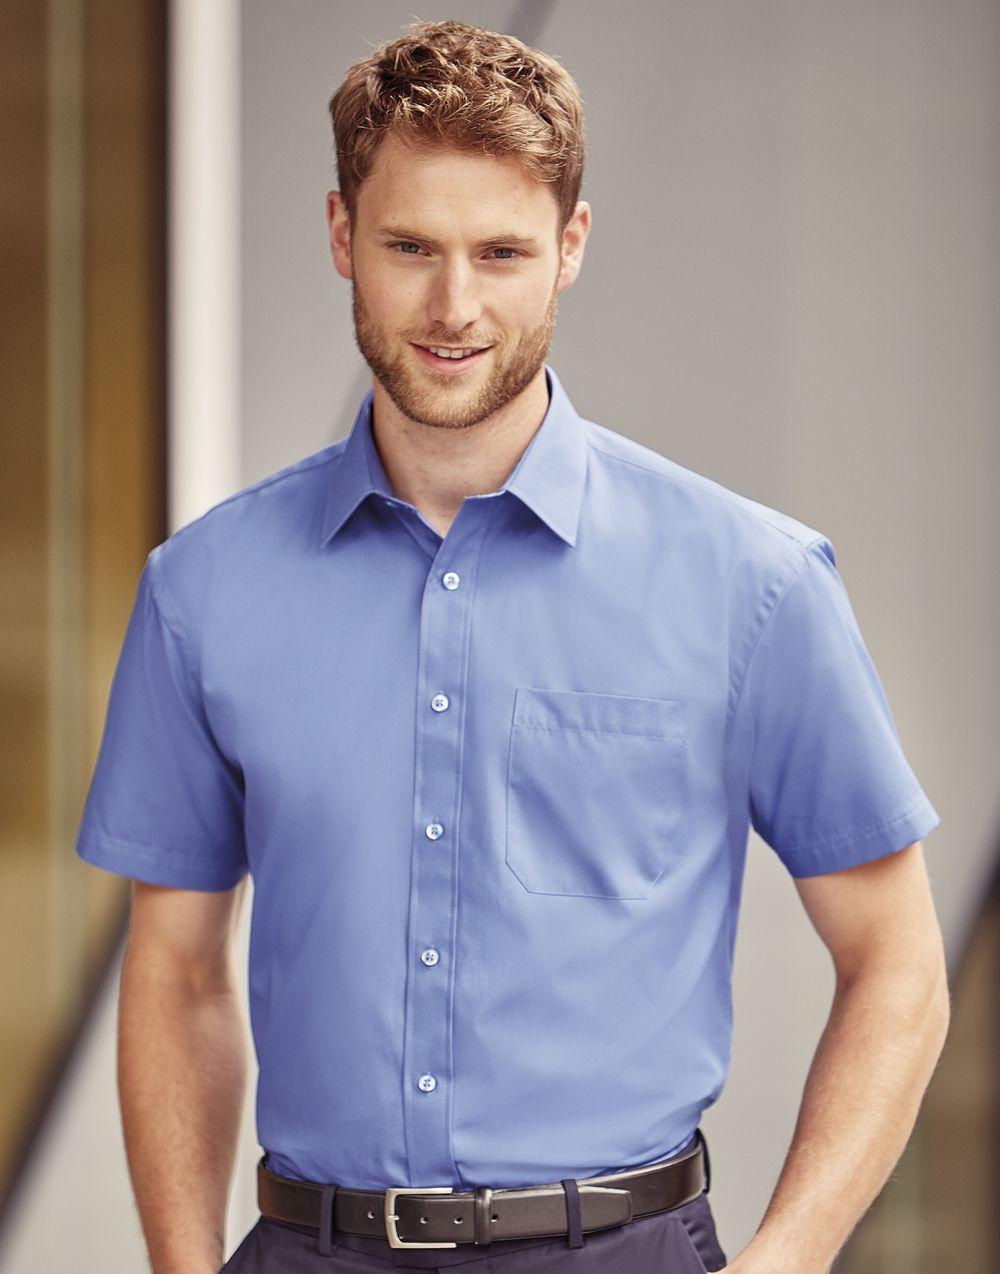 Camisas manga corta russell popelin manga corta hombre con bolsillo con publicidad vista 1